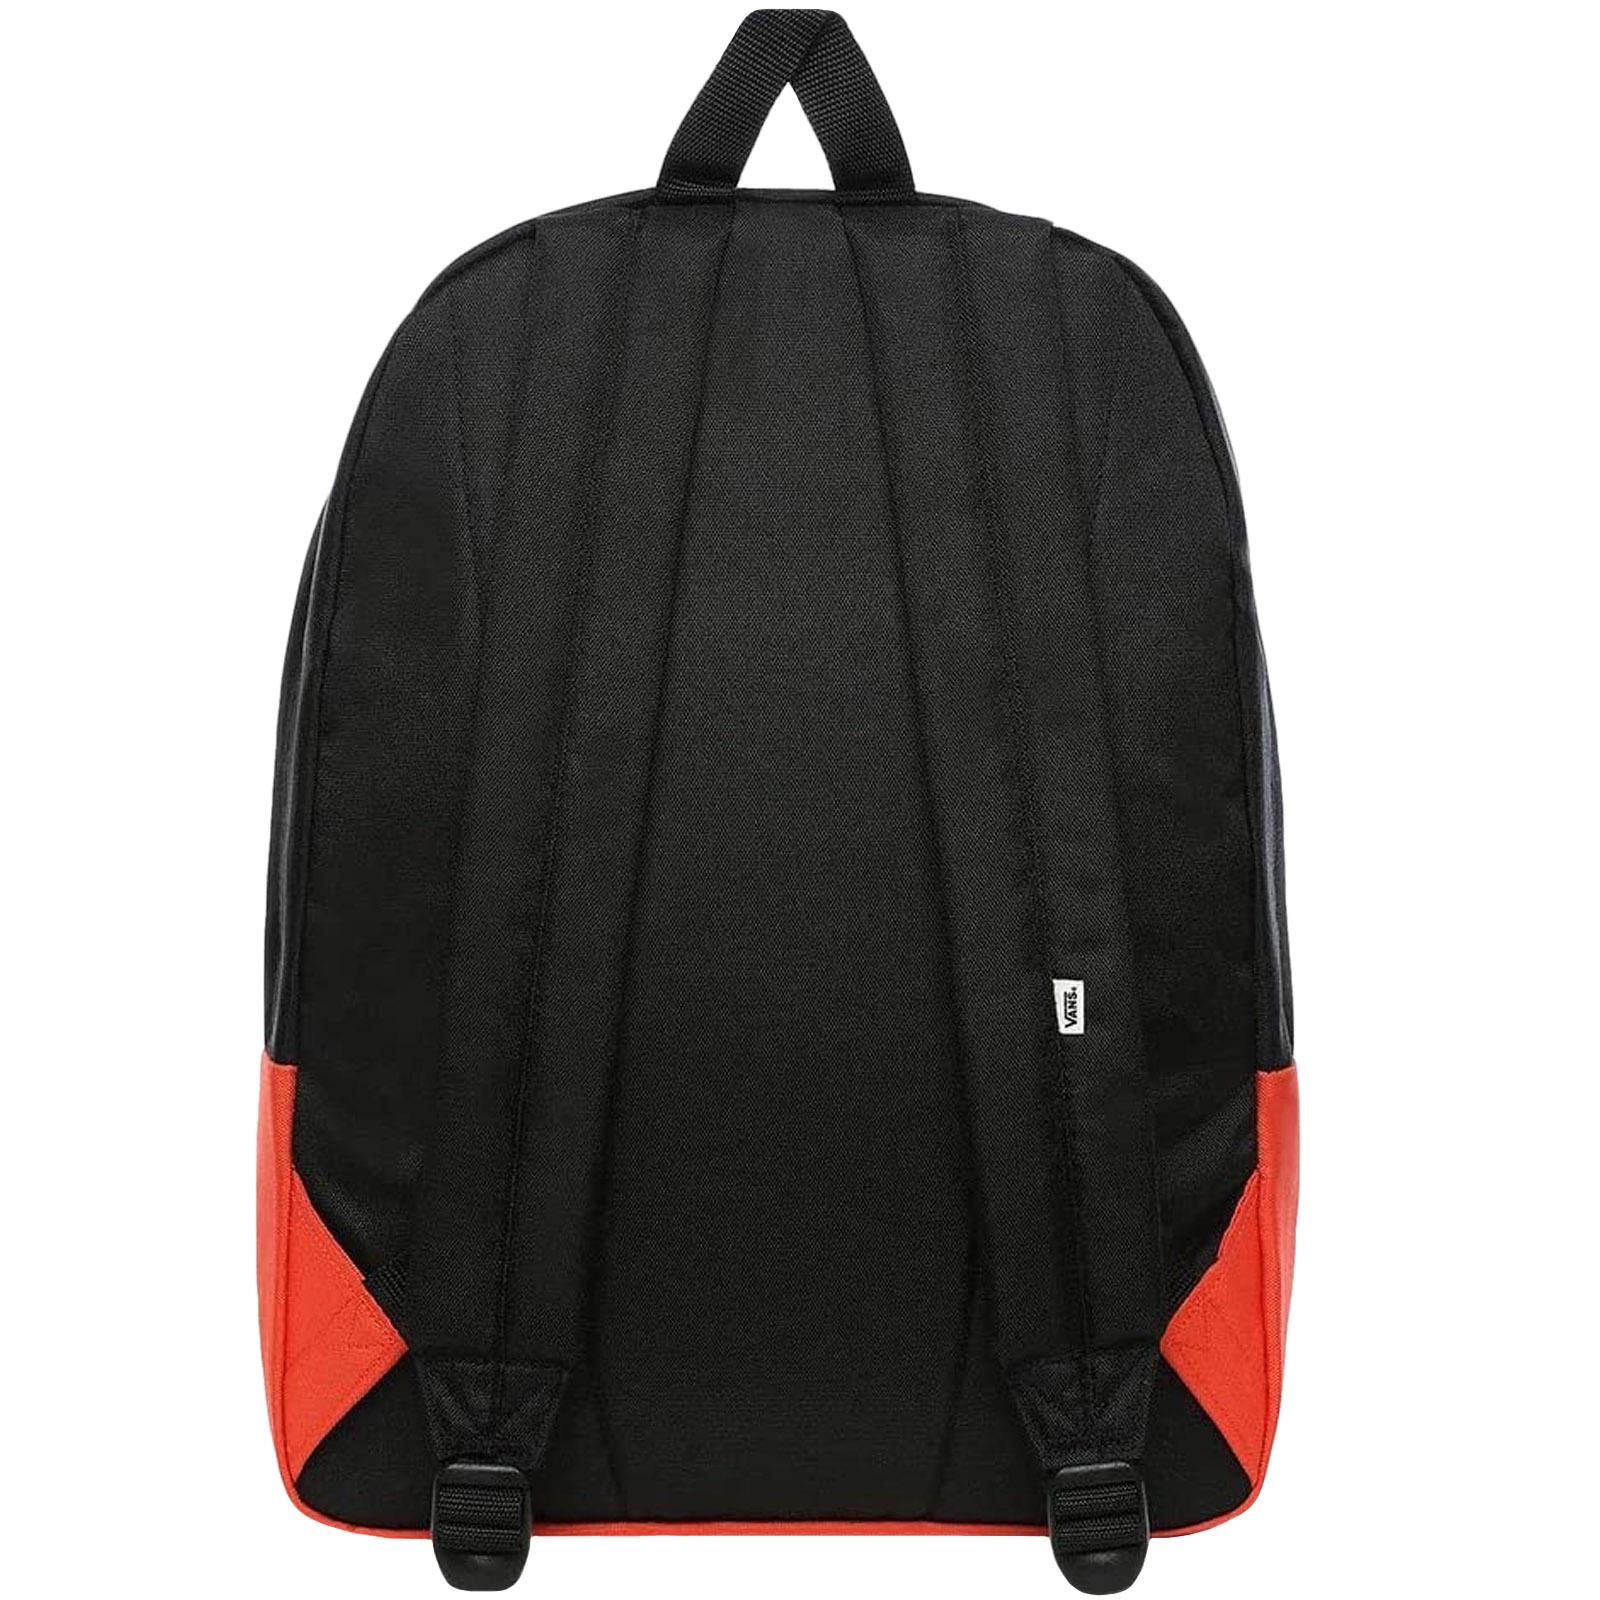 thumbnail 6 - Vans Unisex Two Strap Realm Adjustable School College Rucksack Backpack Bag